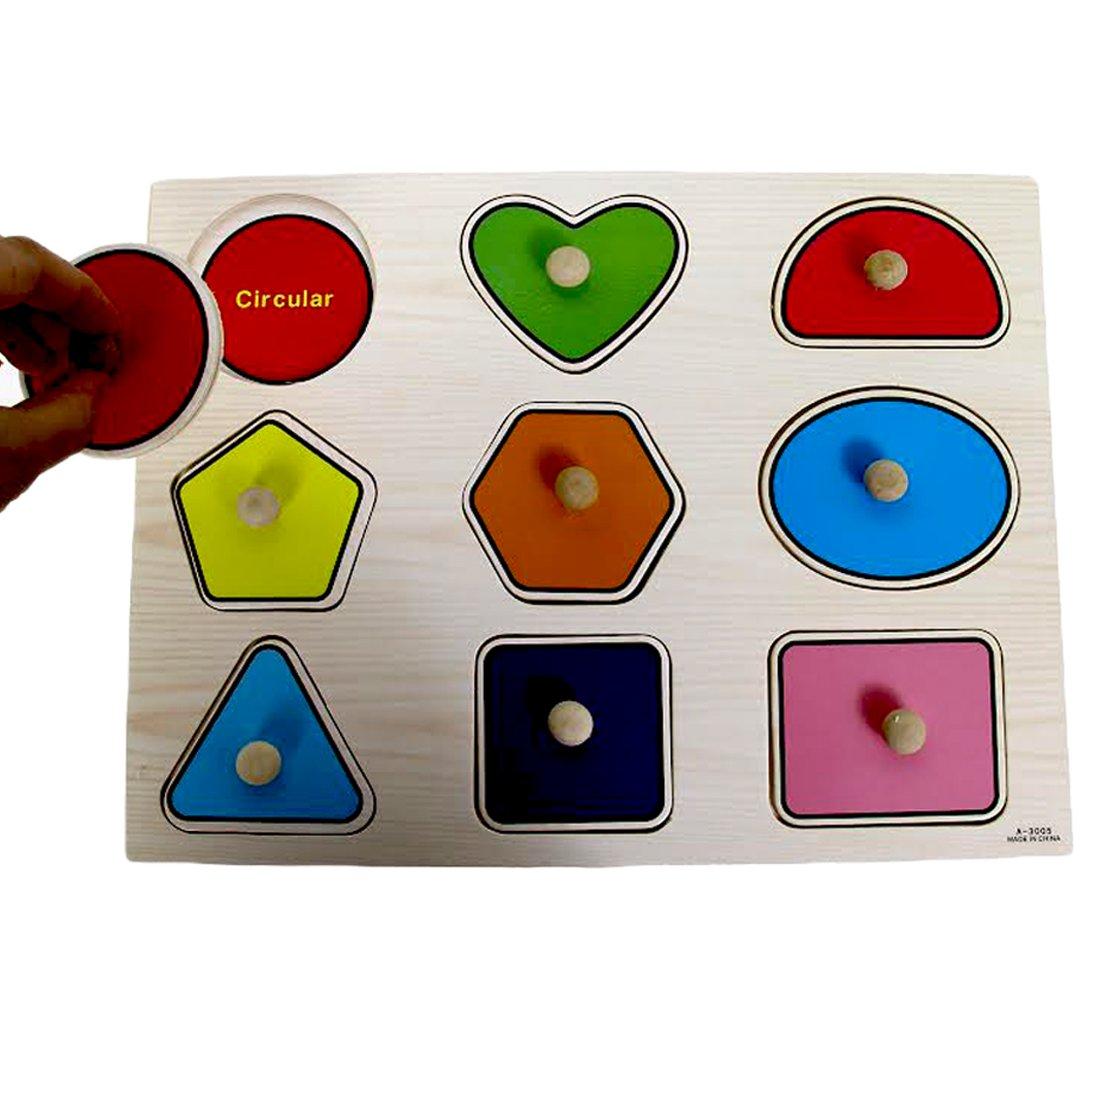 Dazzling Toys Kids Favorite Wooden Large Shapes Puzzle